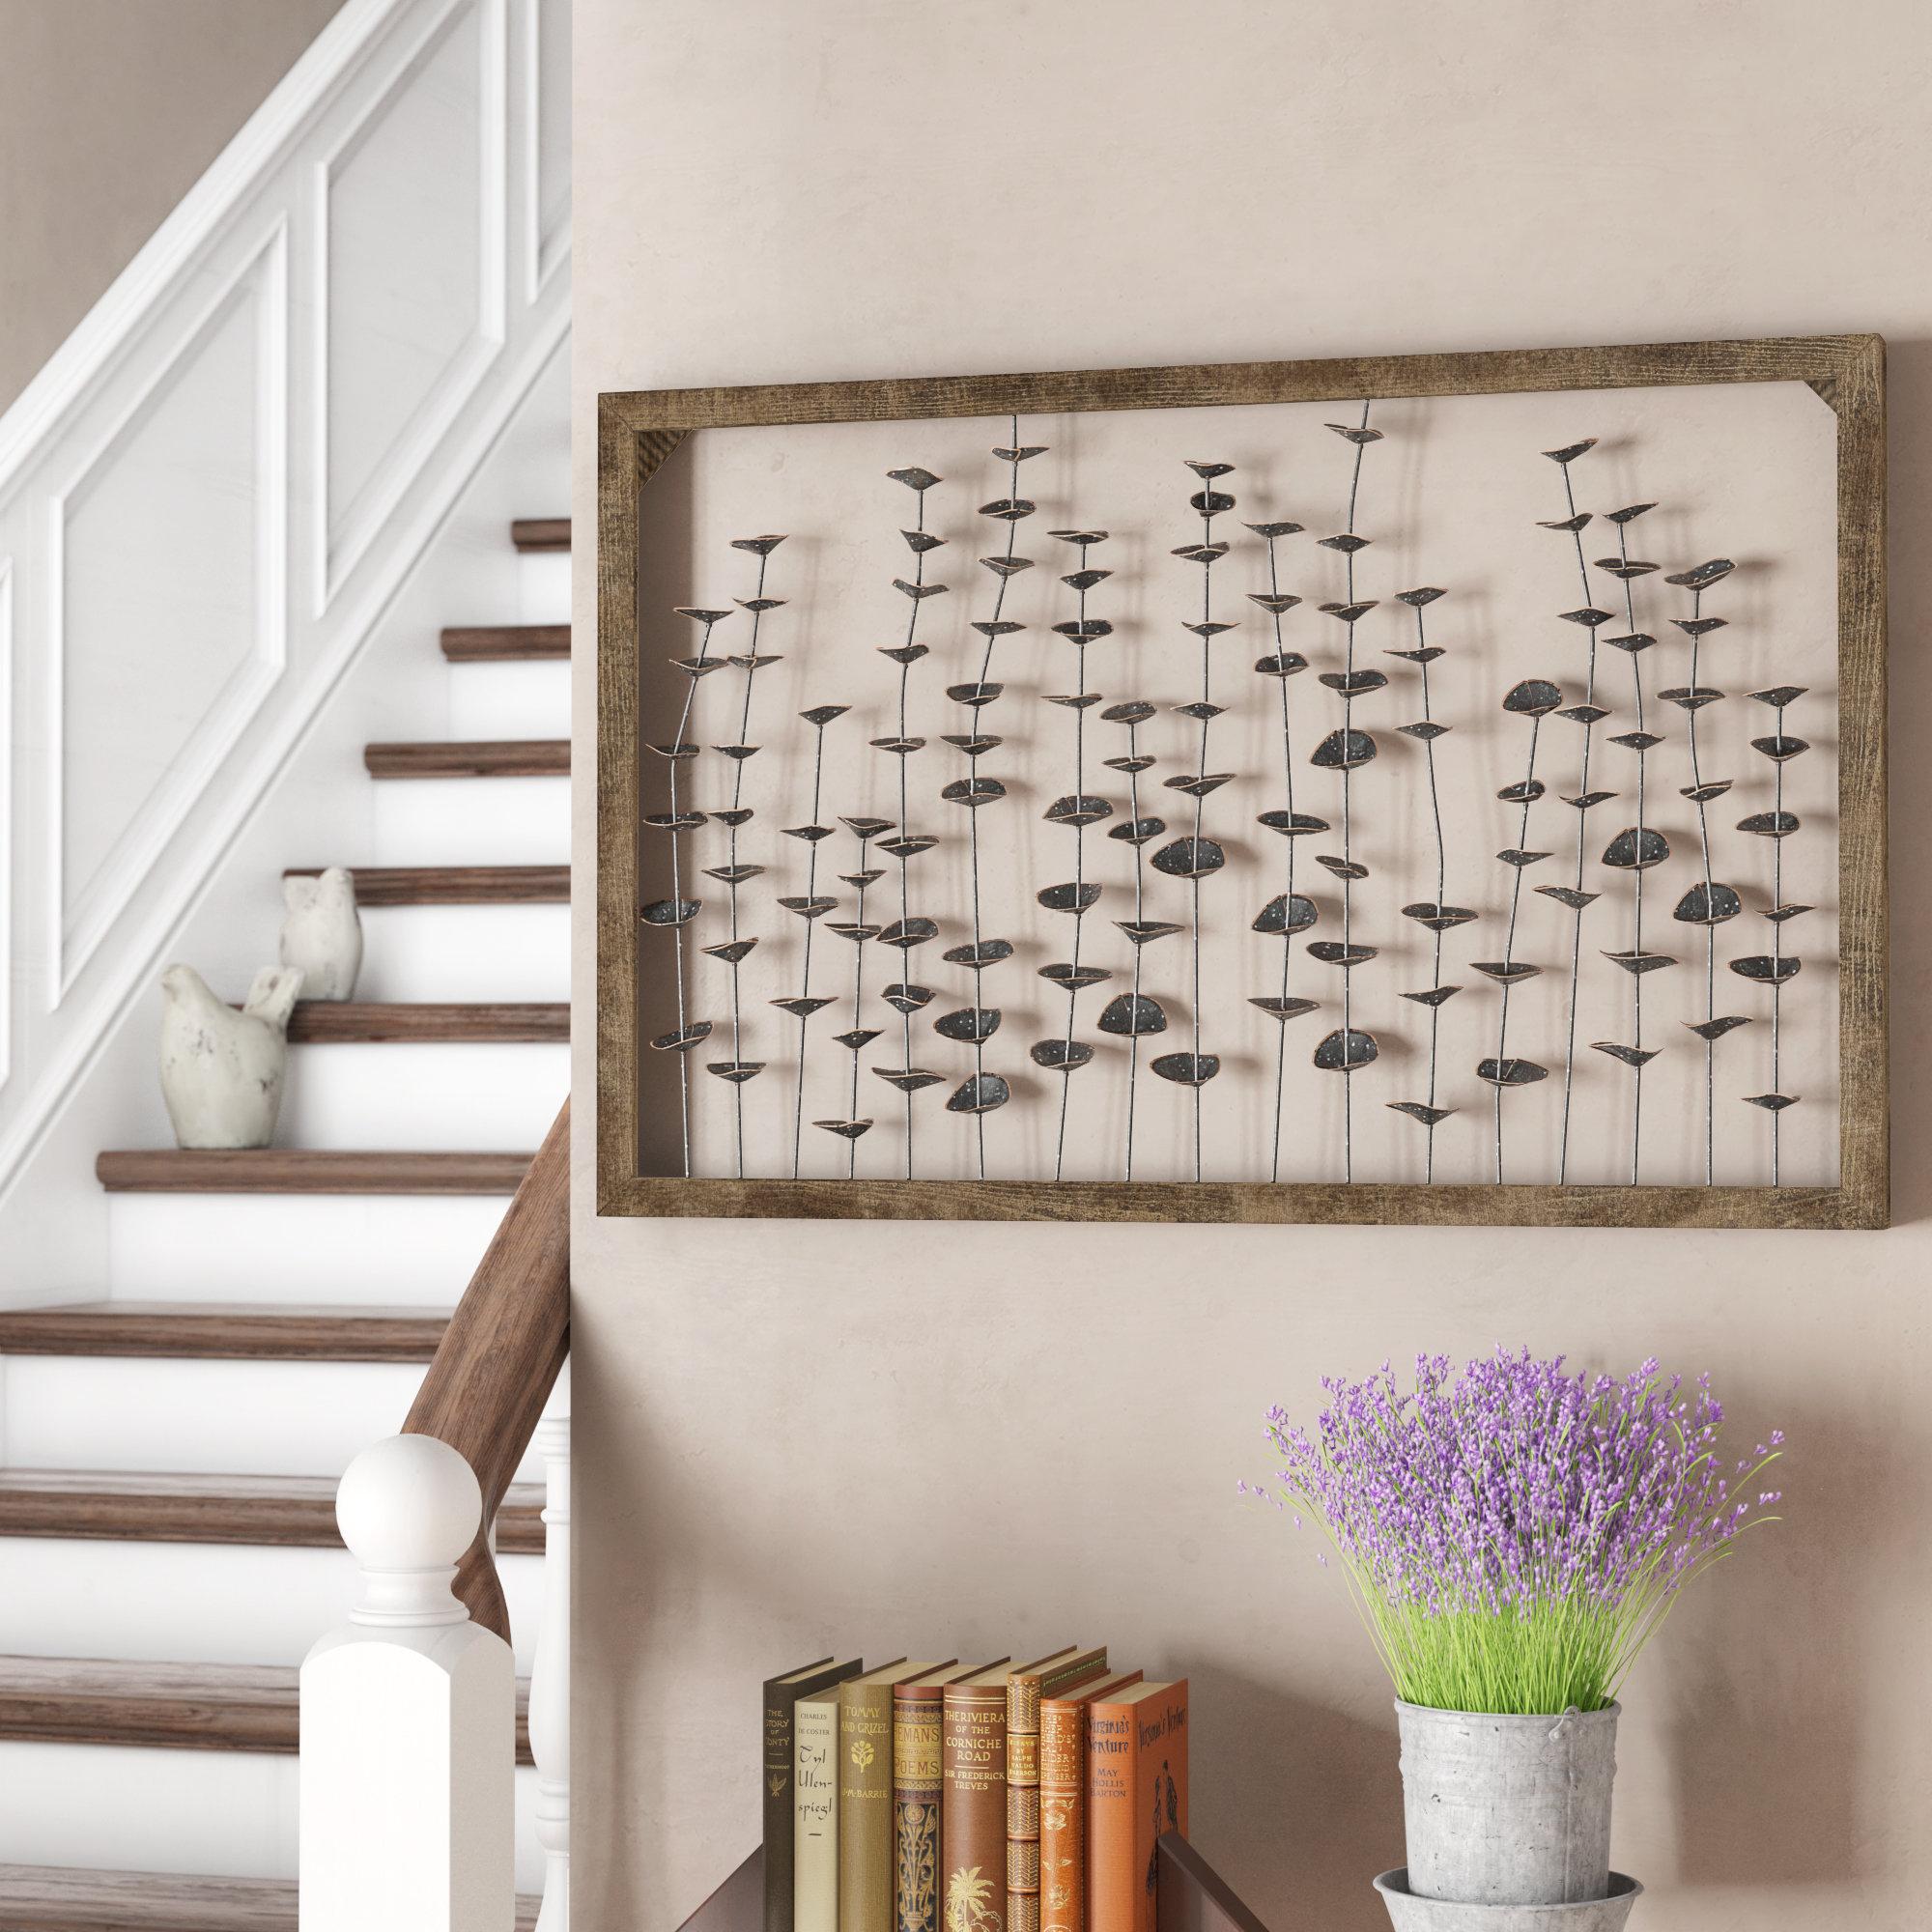 Metal Letter Wall Art | Wayfair within Millanocket Metal Wheel Photo Holder Wall Decor (Image 21 of 30)